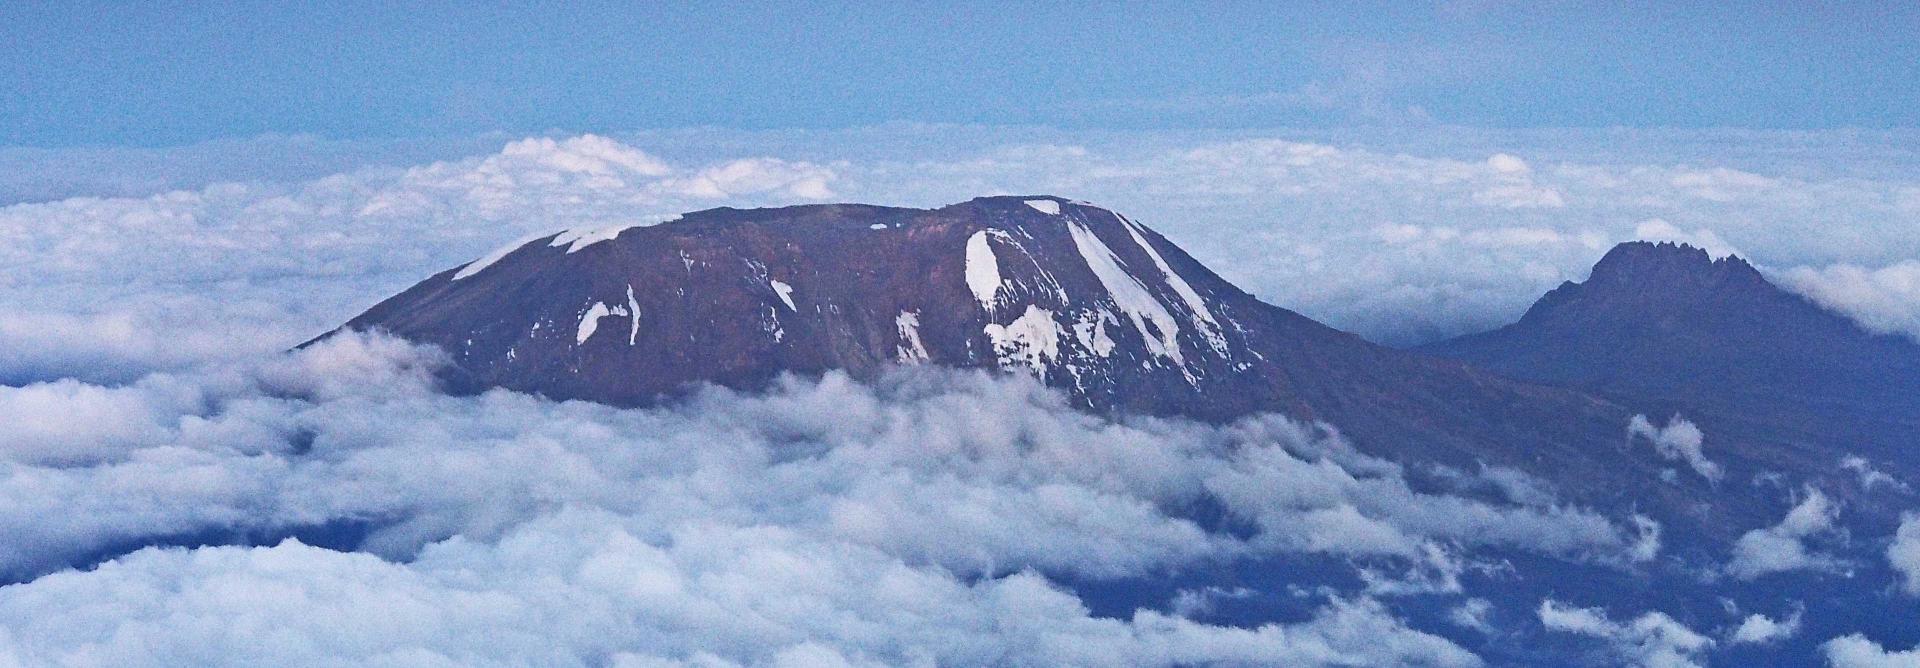 Kilimanjaro Hike Day Trip